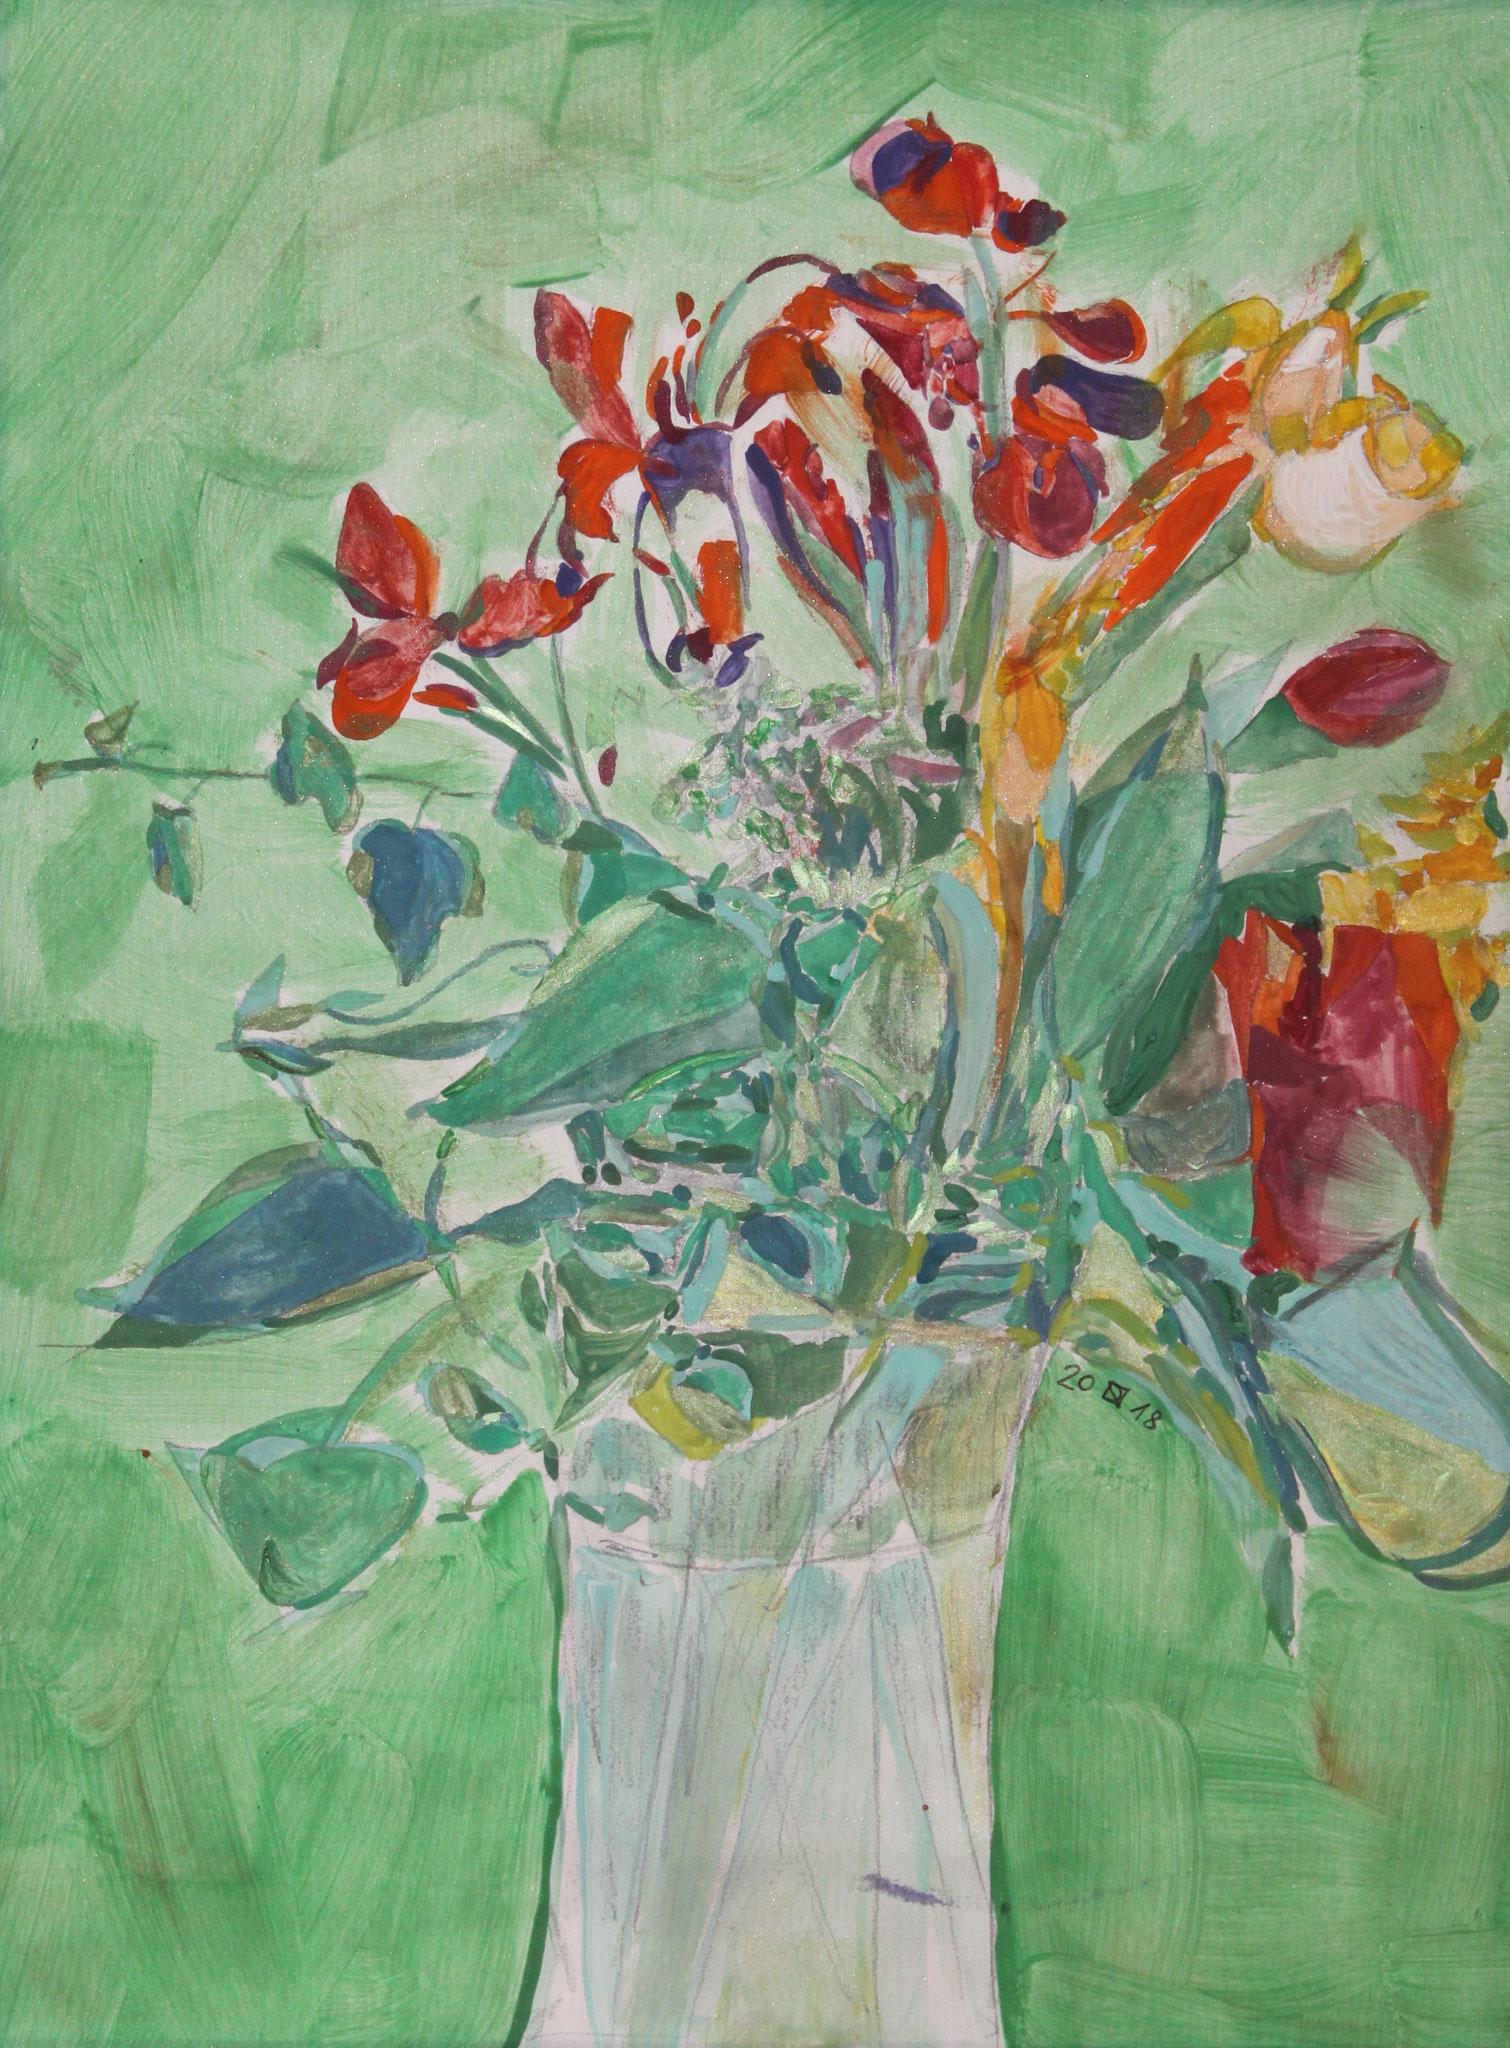 Frauenschuh, 2018, Gouache und Aquarell auf Papier, 42 cm x 30 cm